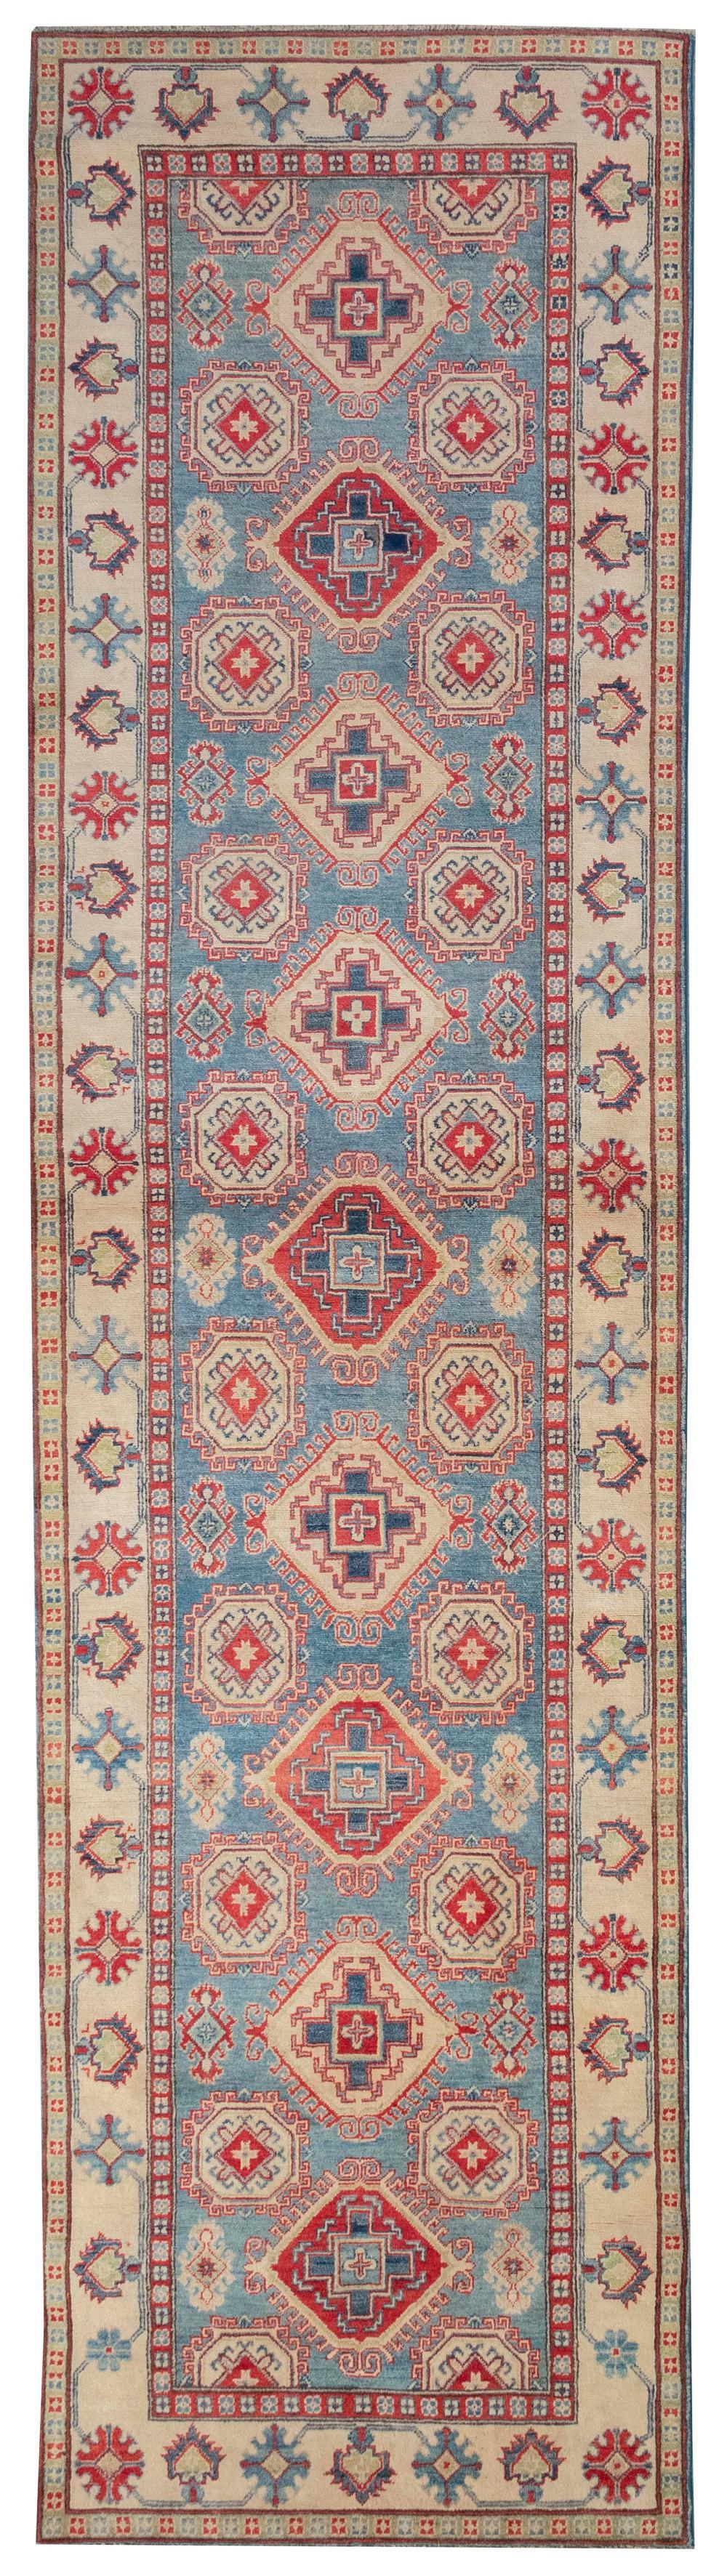 "ORIENTAL RUG: KAZAK DESIGN CORRIDOR CARPET 4'1"" x 15'8"""